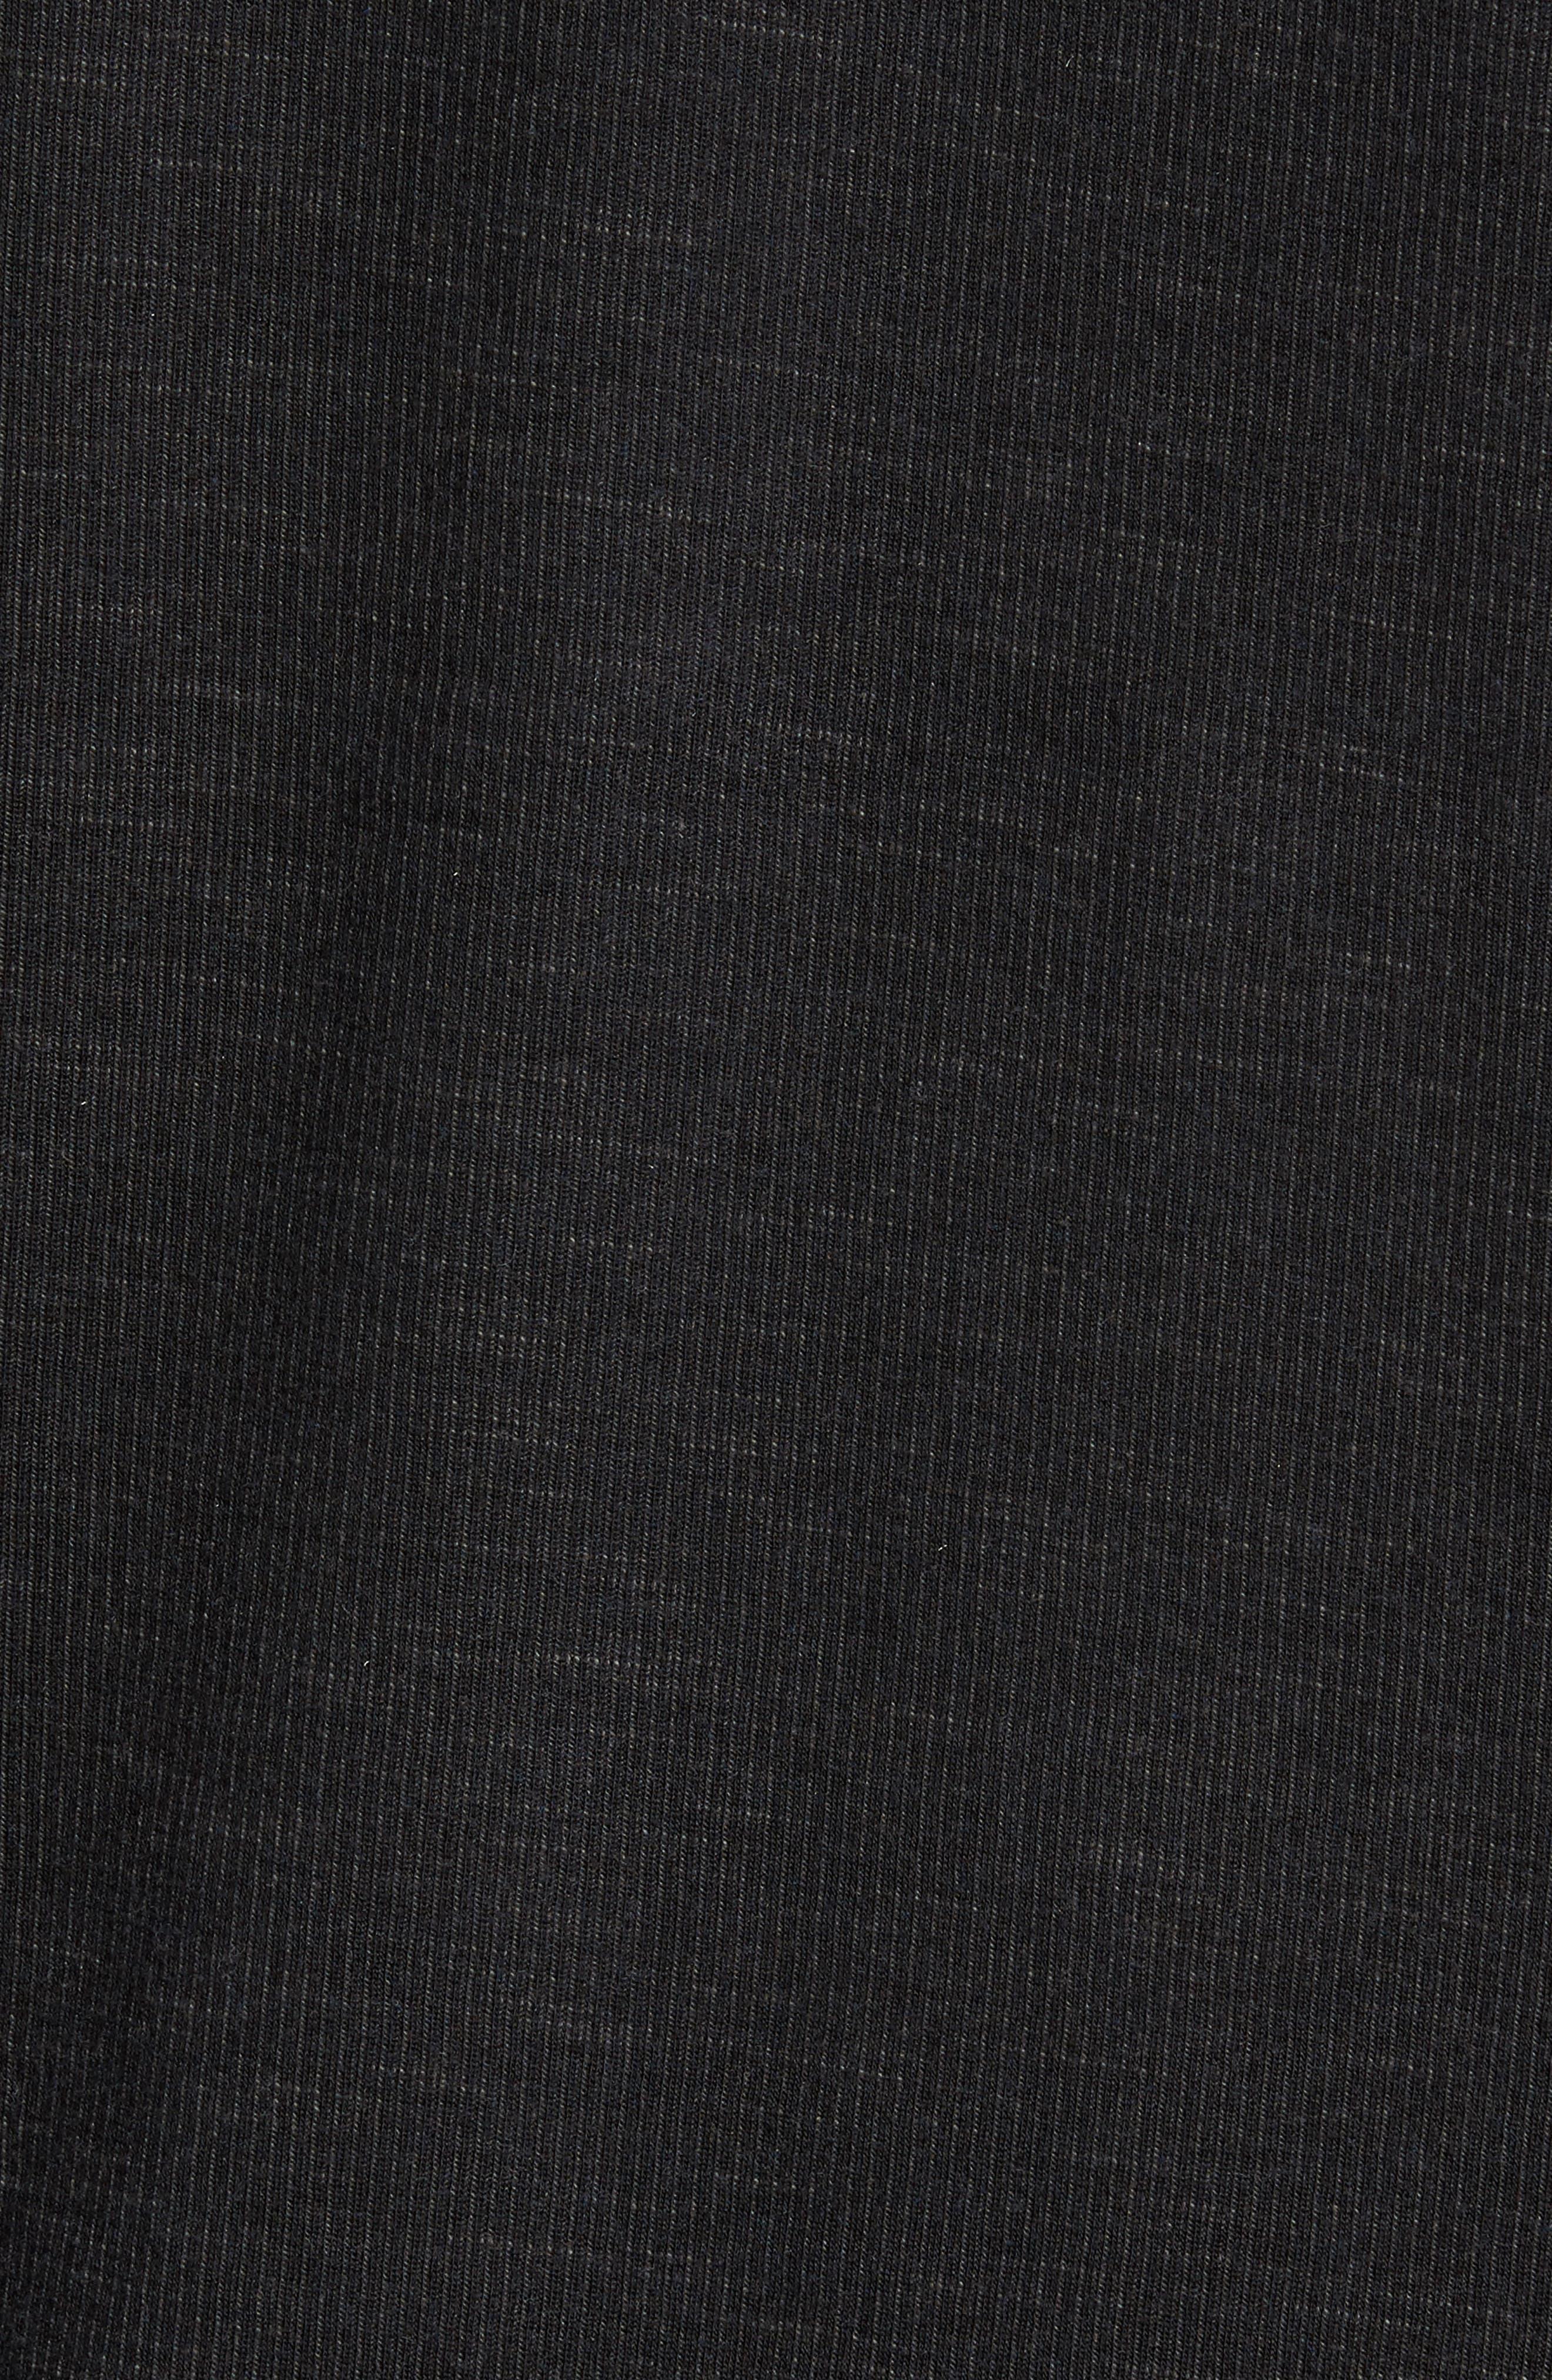 Flipside Pro Reversible Sweatshirt,                             Alternate thumbnail 5, color,                             001